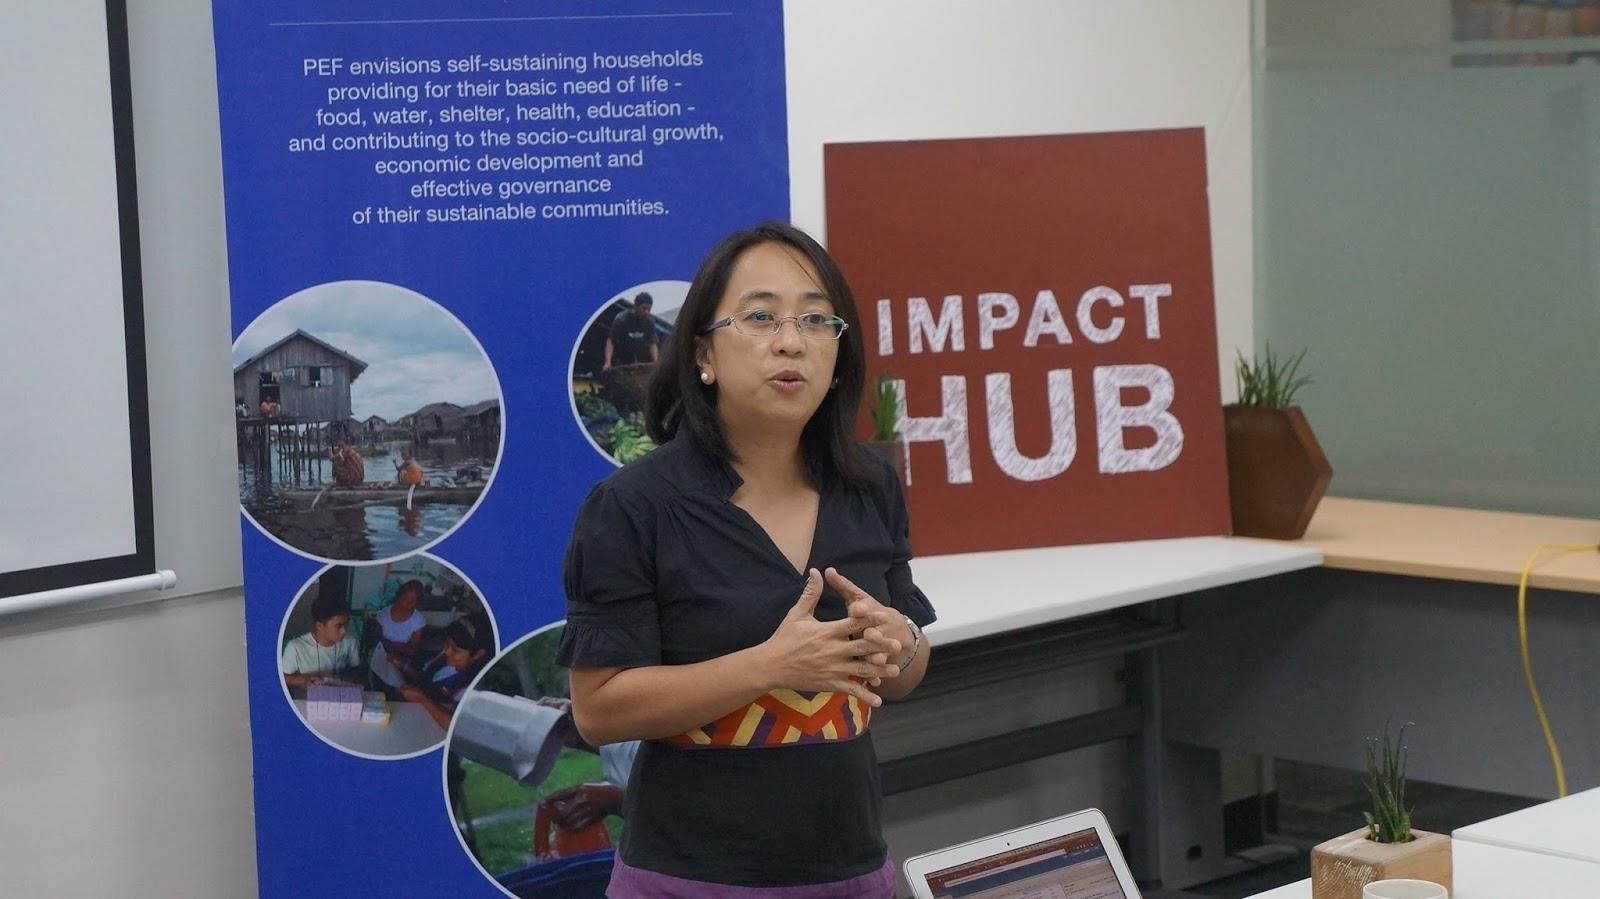 3 startups awarded on impact hub fellowship on sustainable energy the winners were cleverheat higi and solar sari sari store